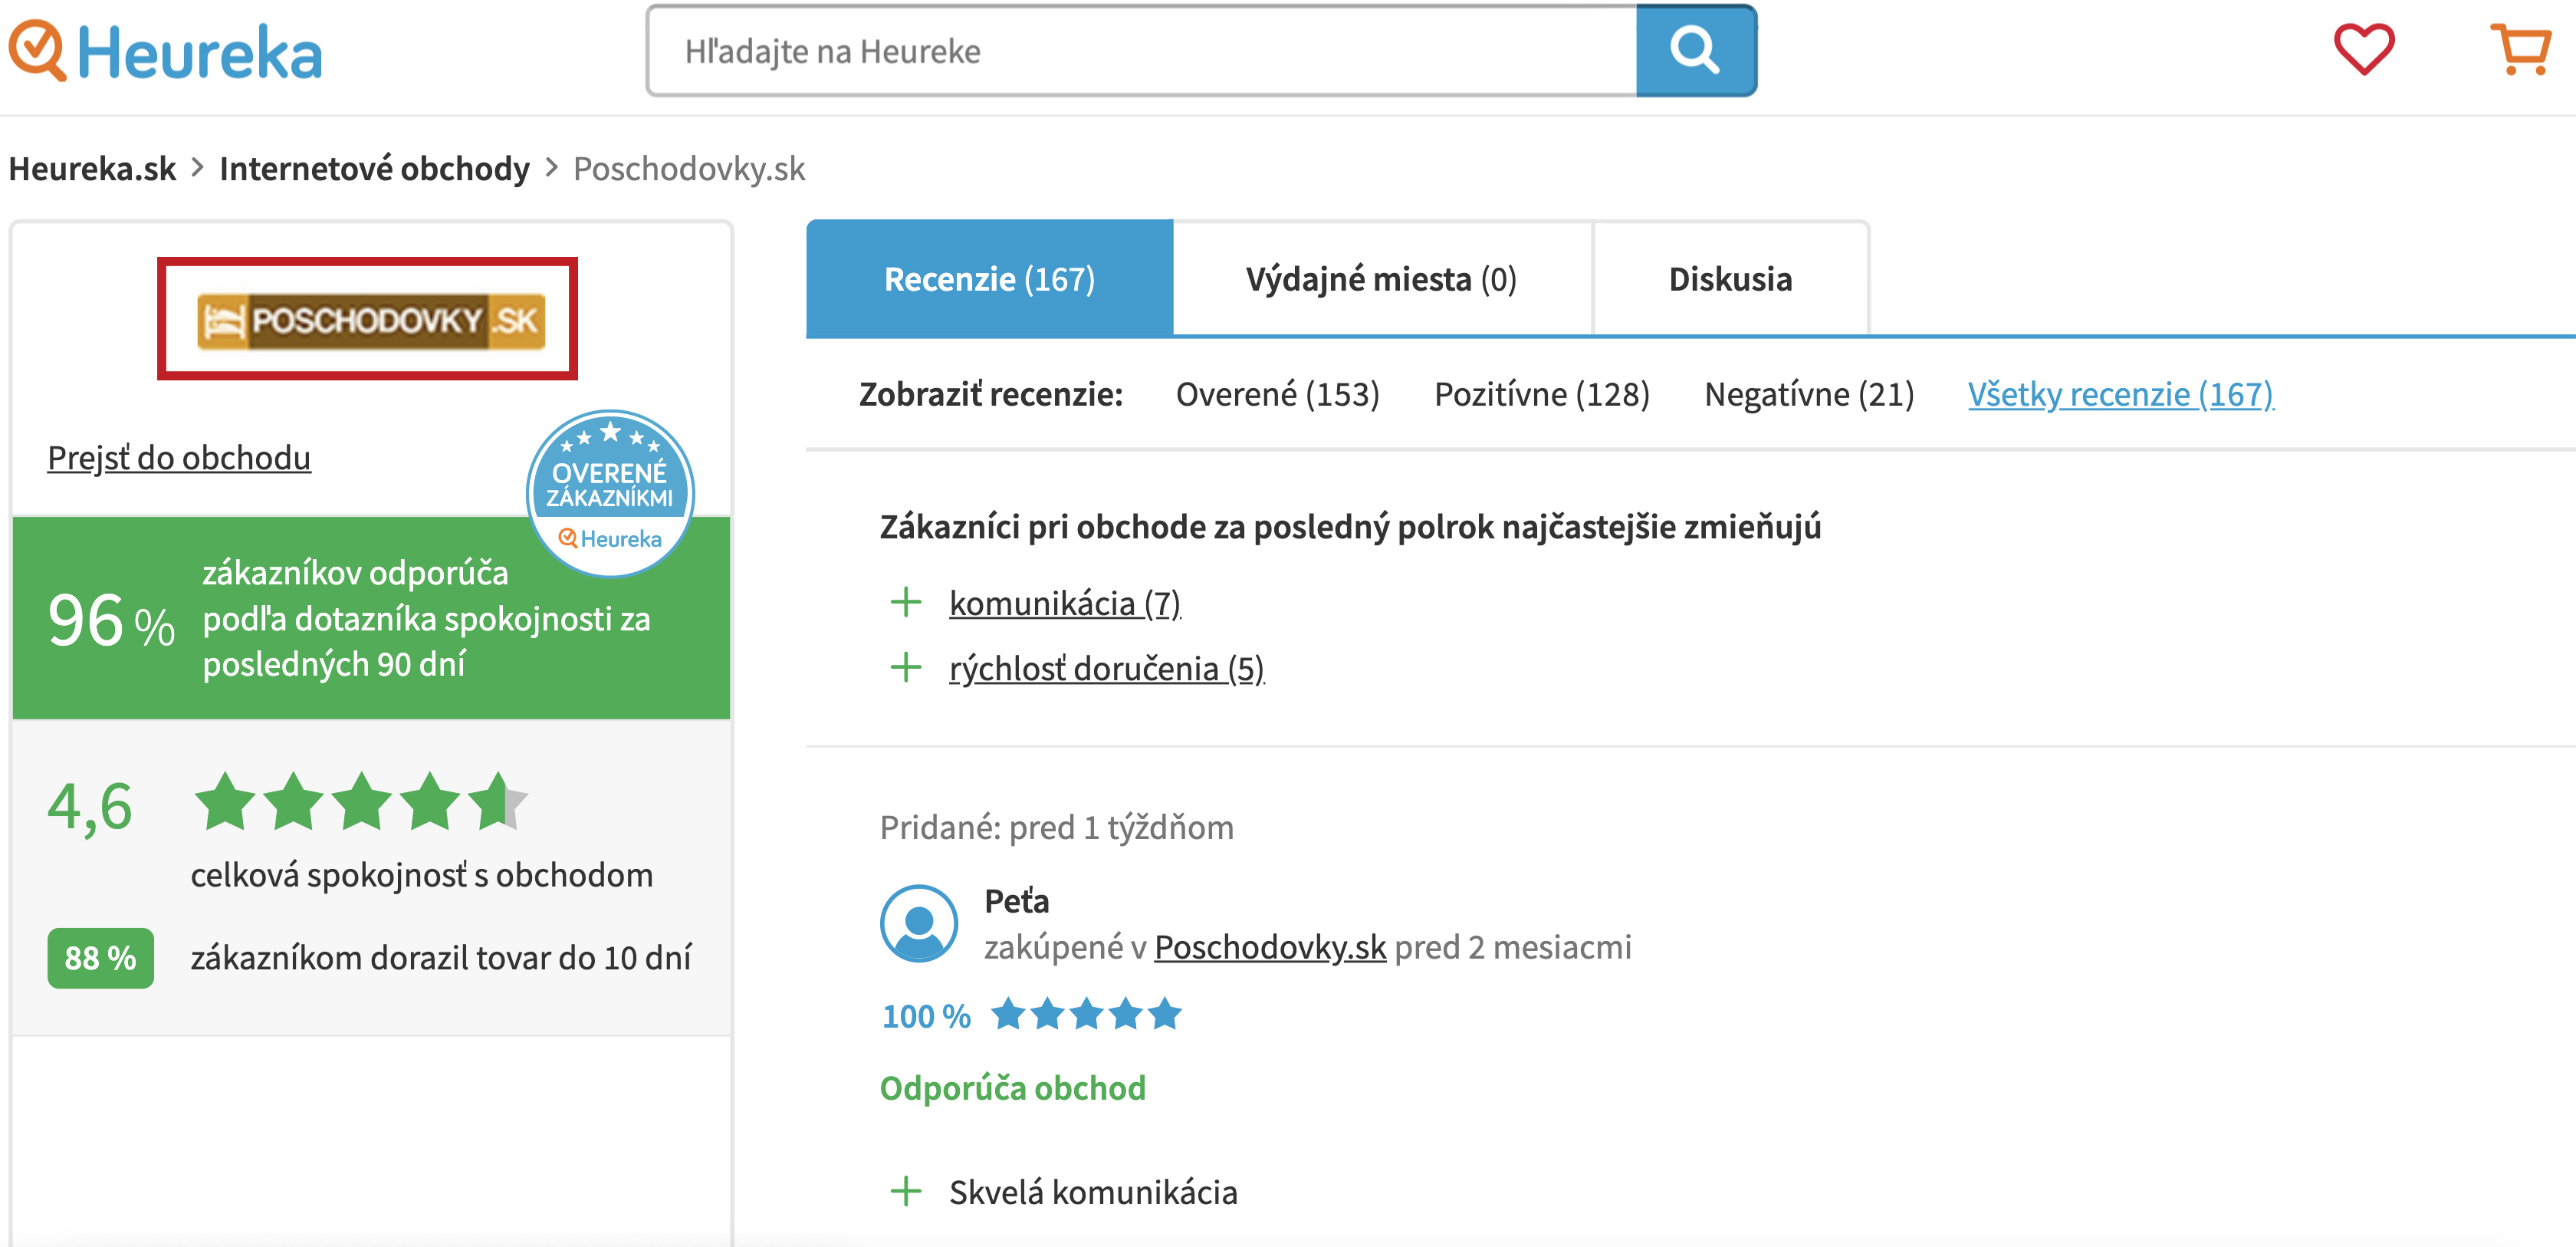 recenzie Heureka poschodovky.sk